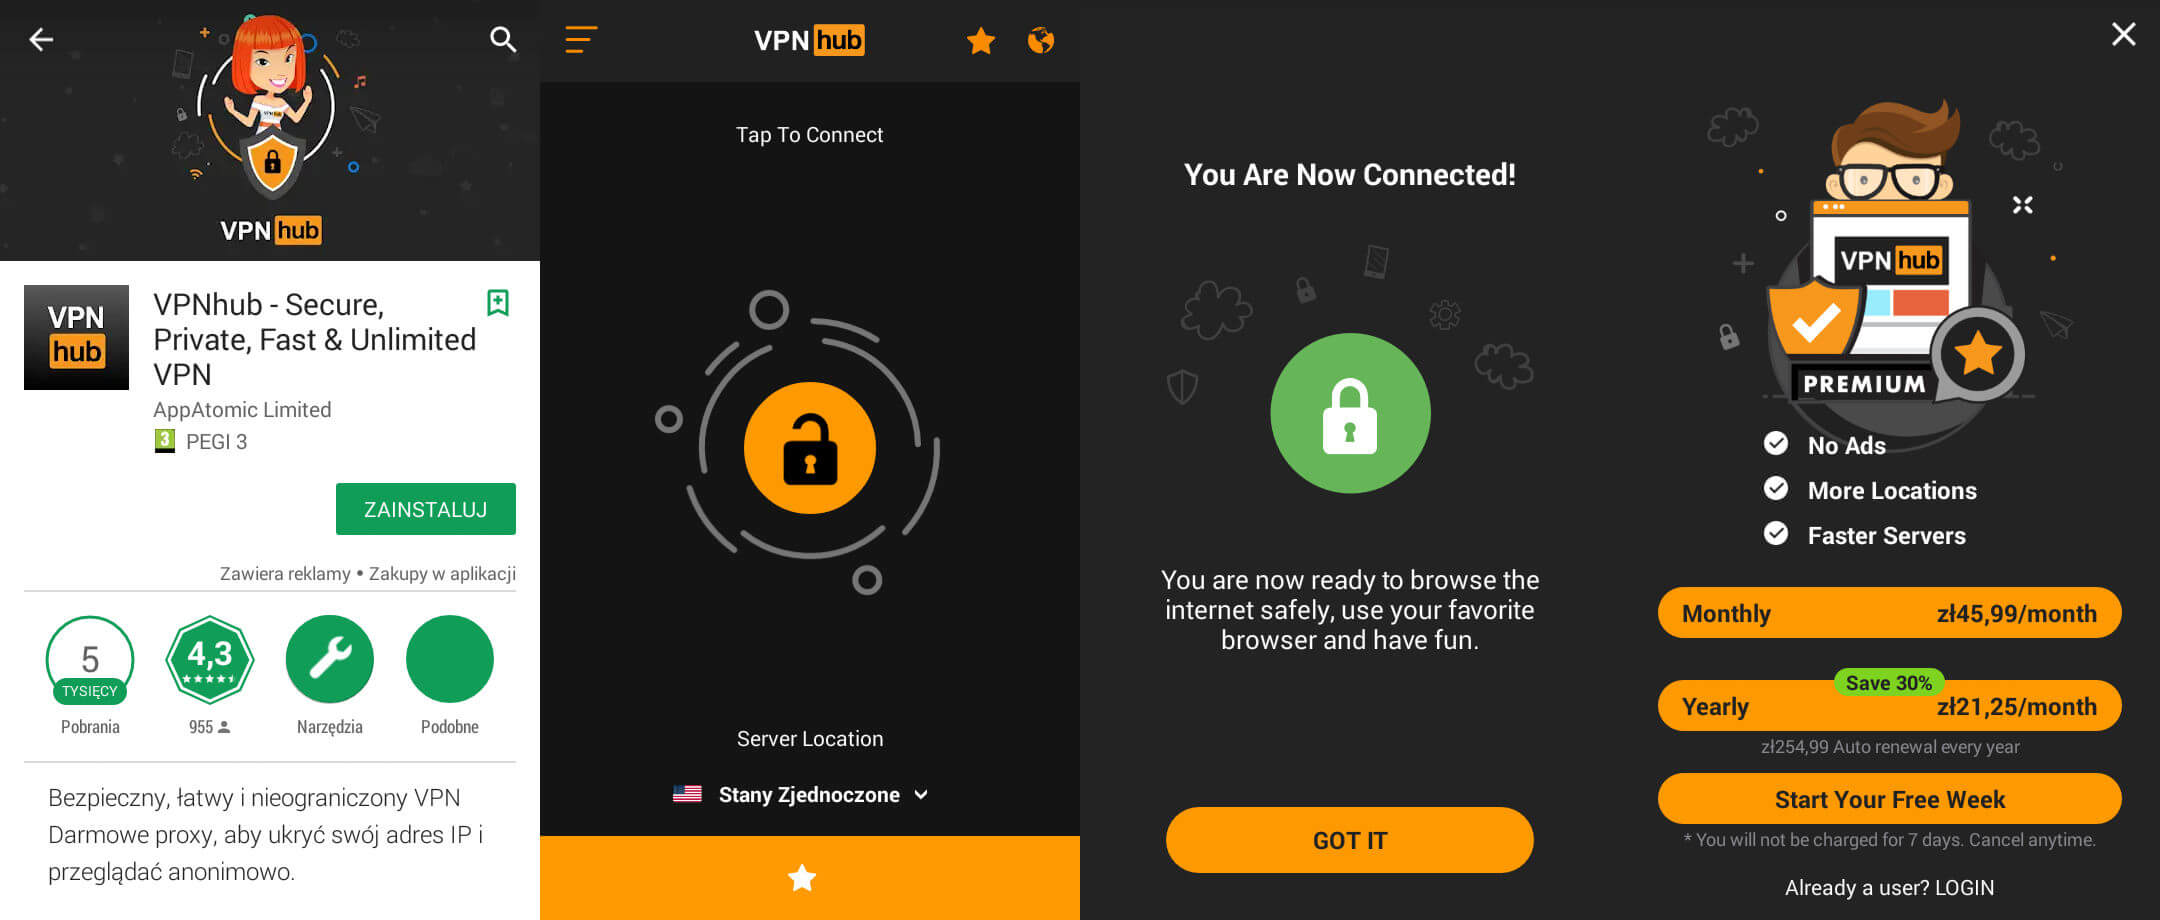 PornHub VPNhub